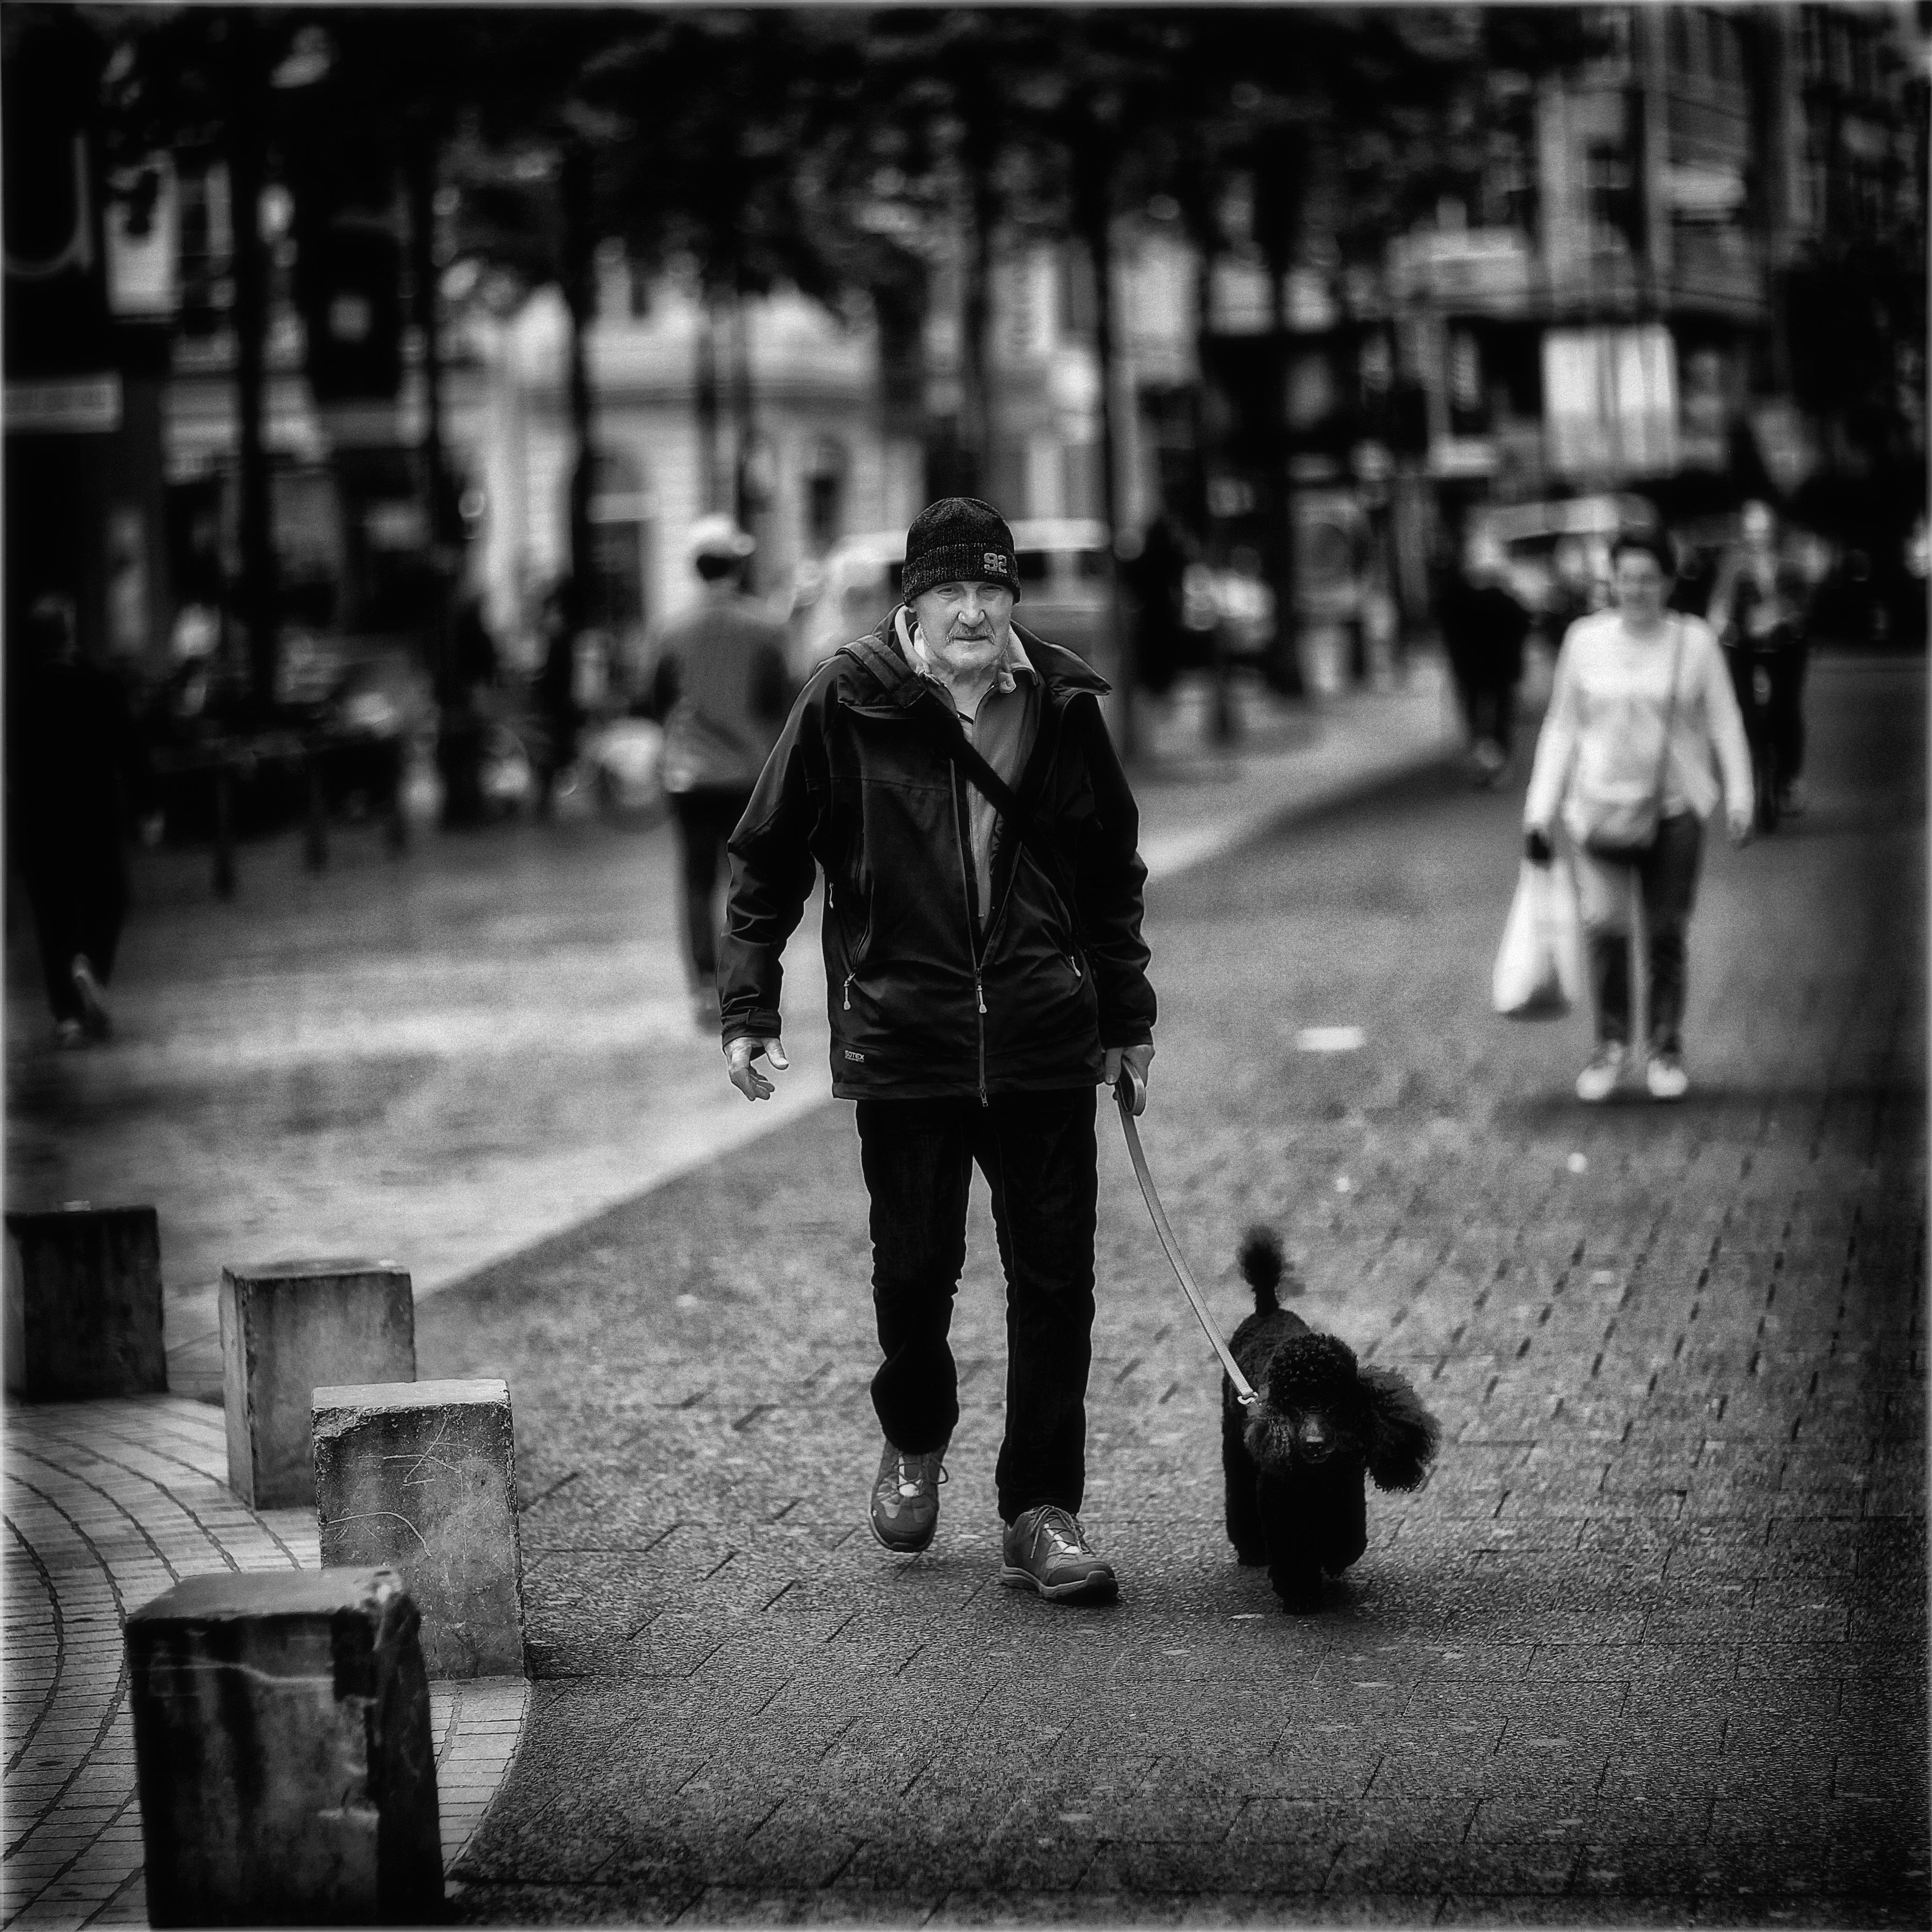 Man with Poodle, Antwerp, Belgium, Blackandwhite, Bw, HQ Photo